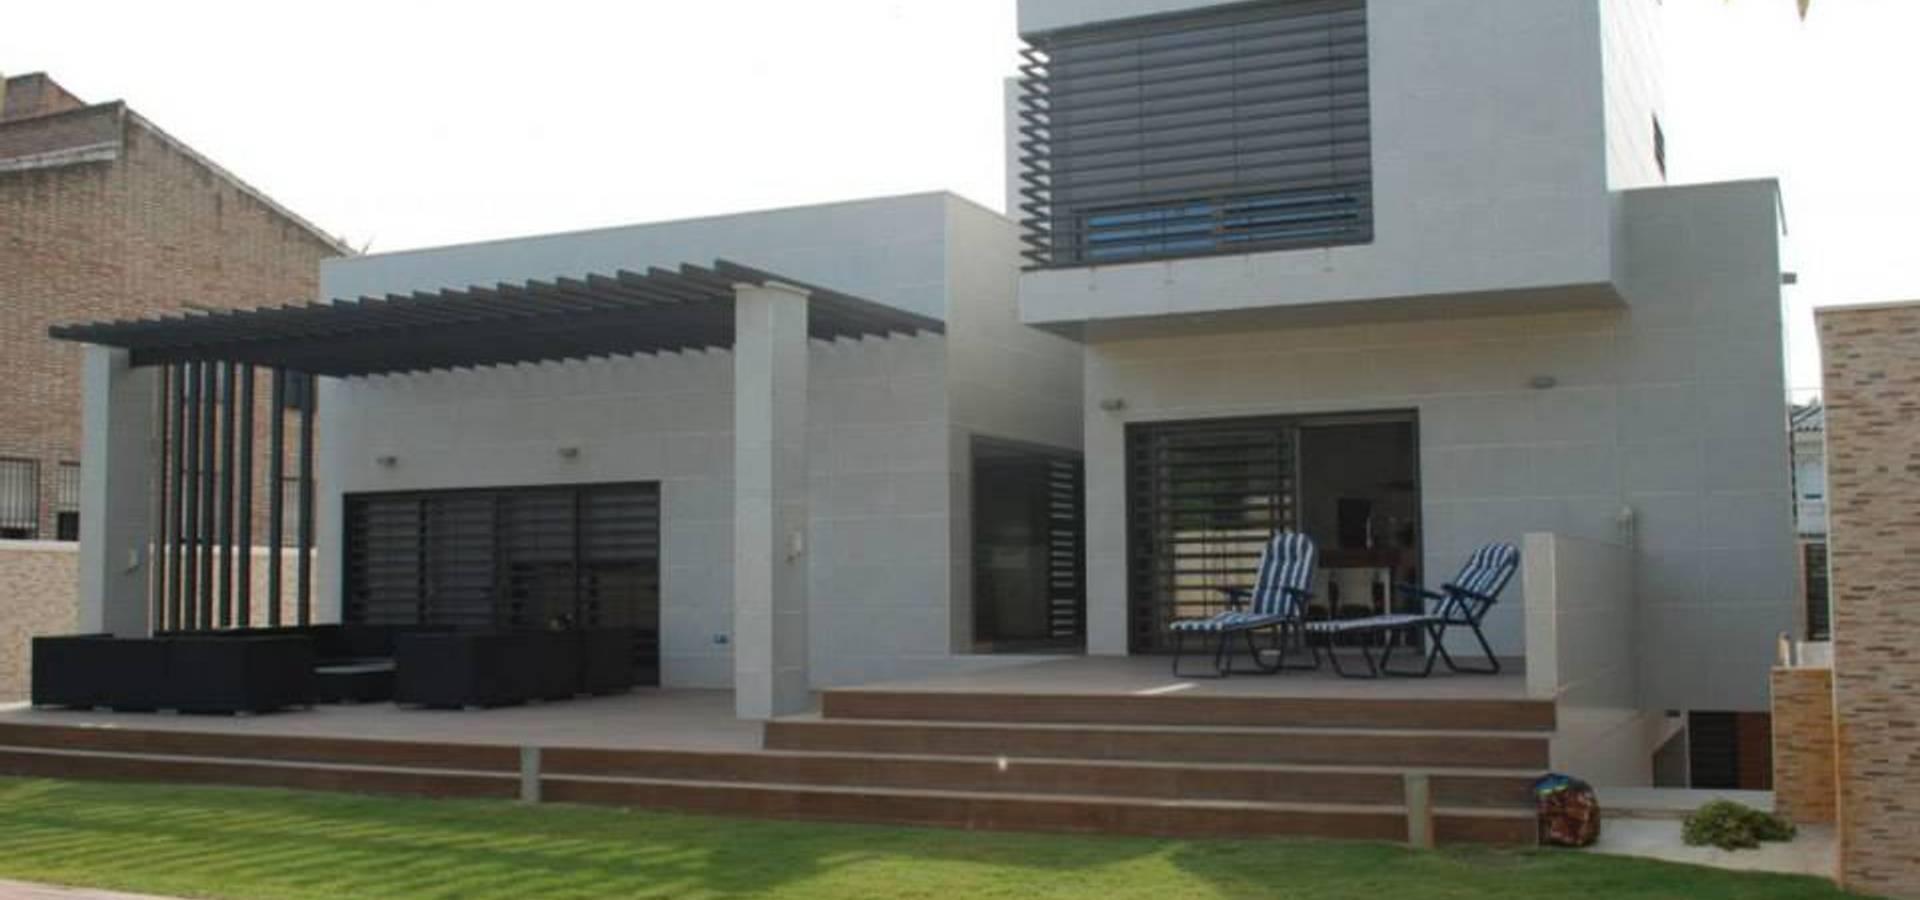 Castello arquitectura arquitectos en cordoba homify for Arquitectos en cordoba